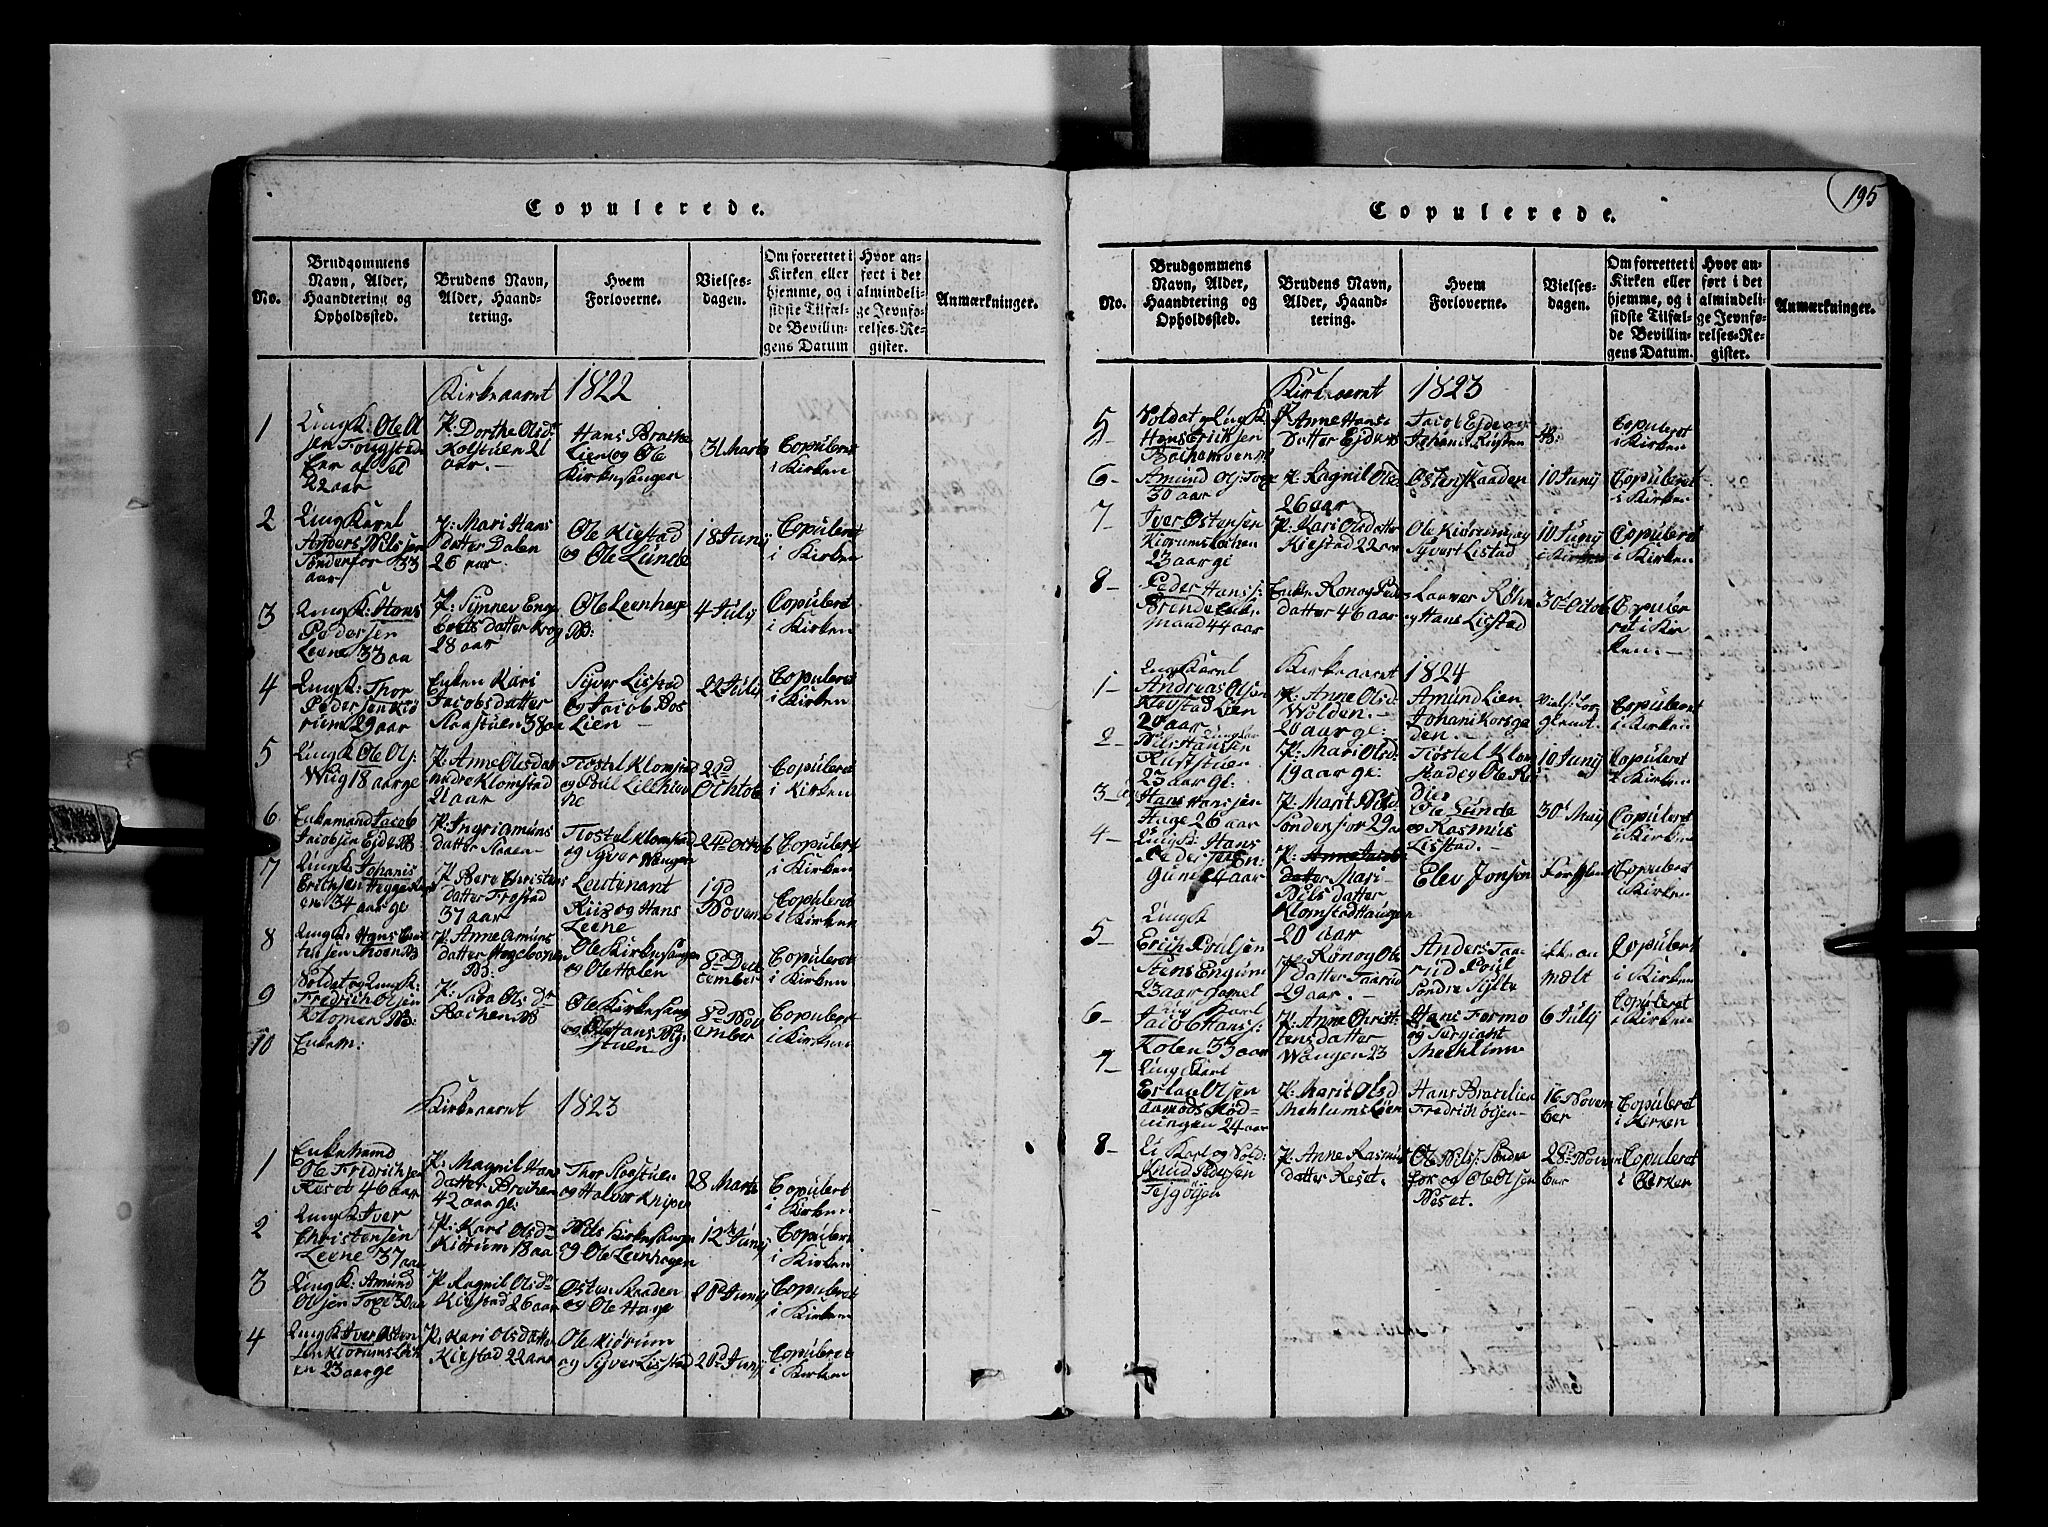 SAH, Fron prestekontor, H/Ha/Hab/L0002: Klokkerbok nr. 2, 1816-1850, s. 195